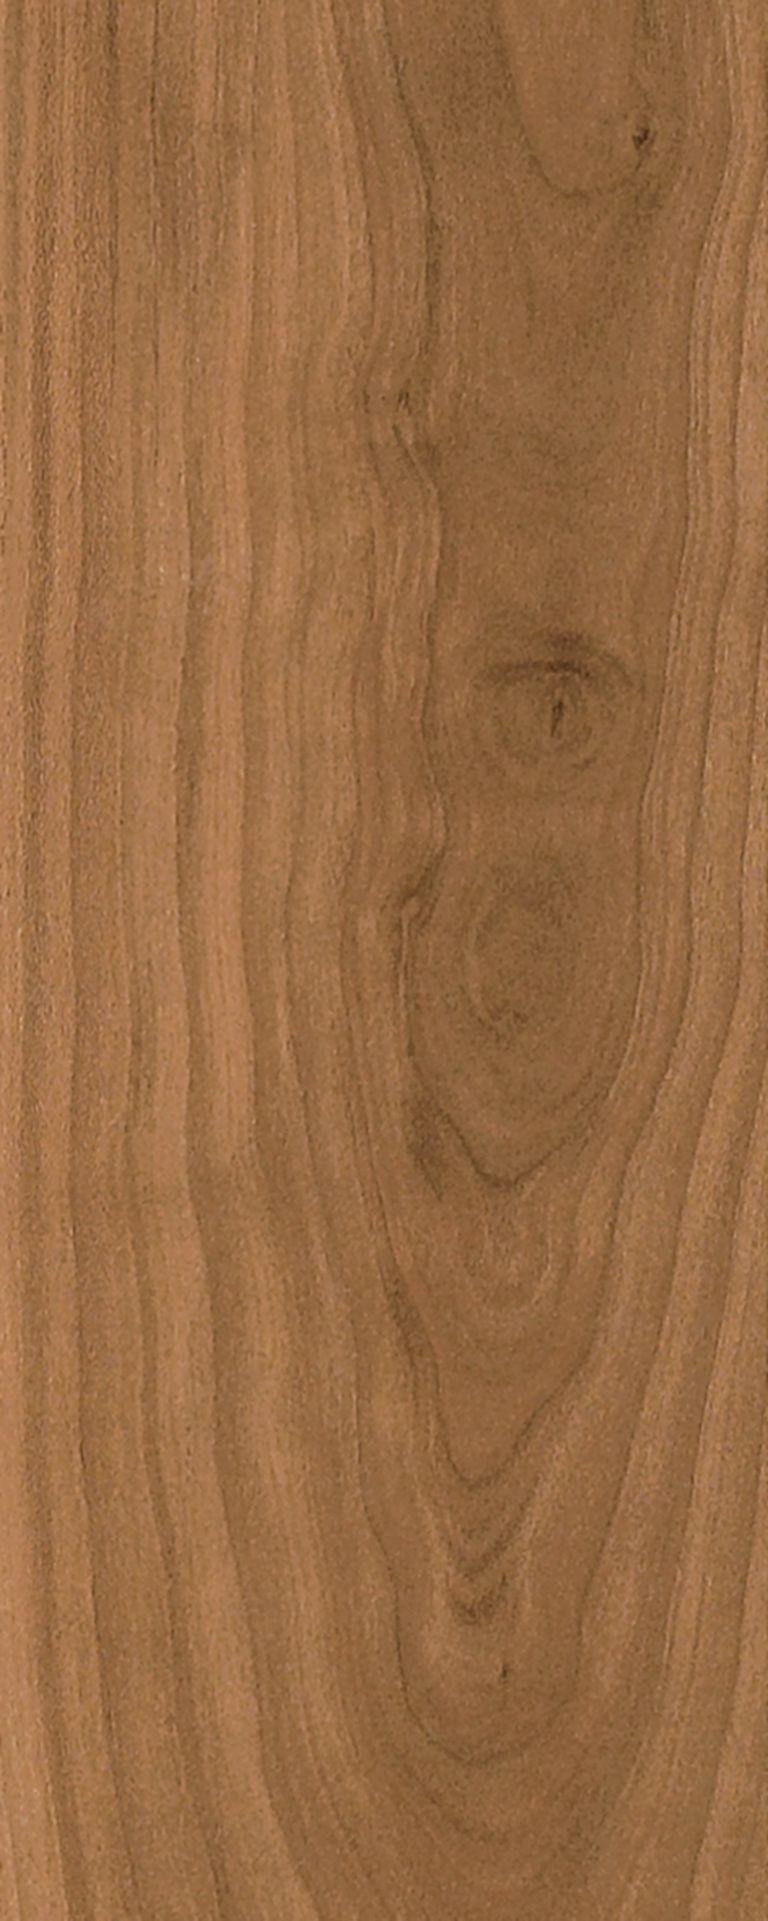 Fruitwood Select Laminado L3044